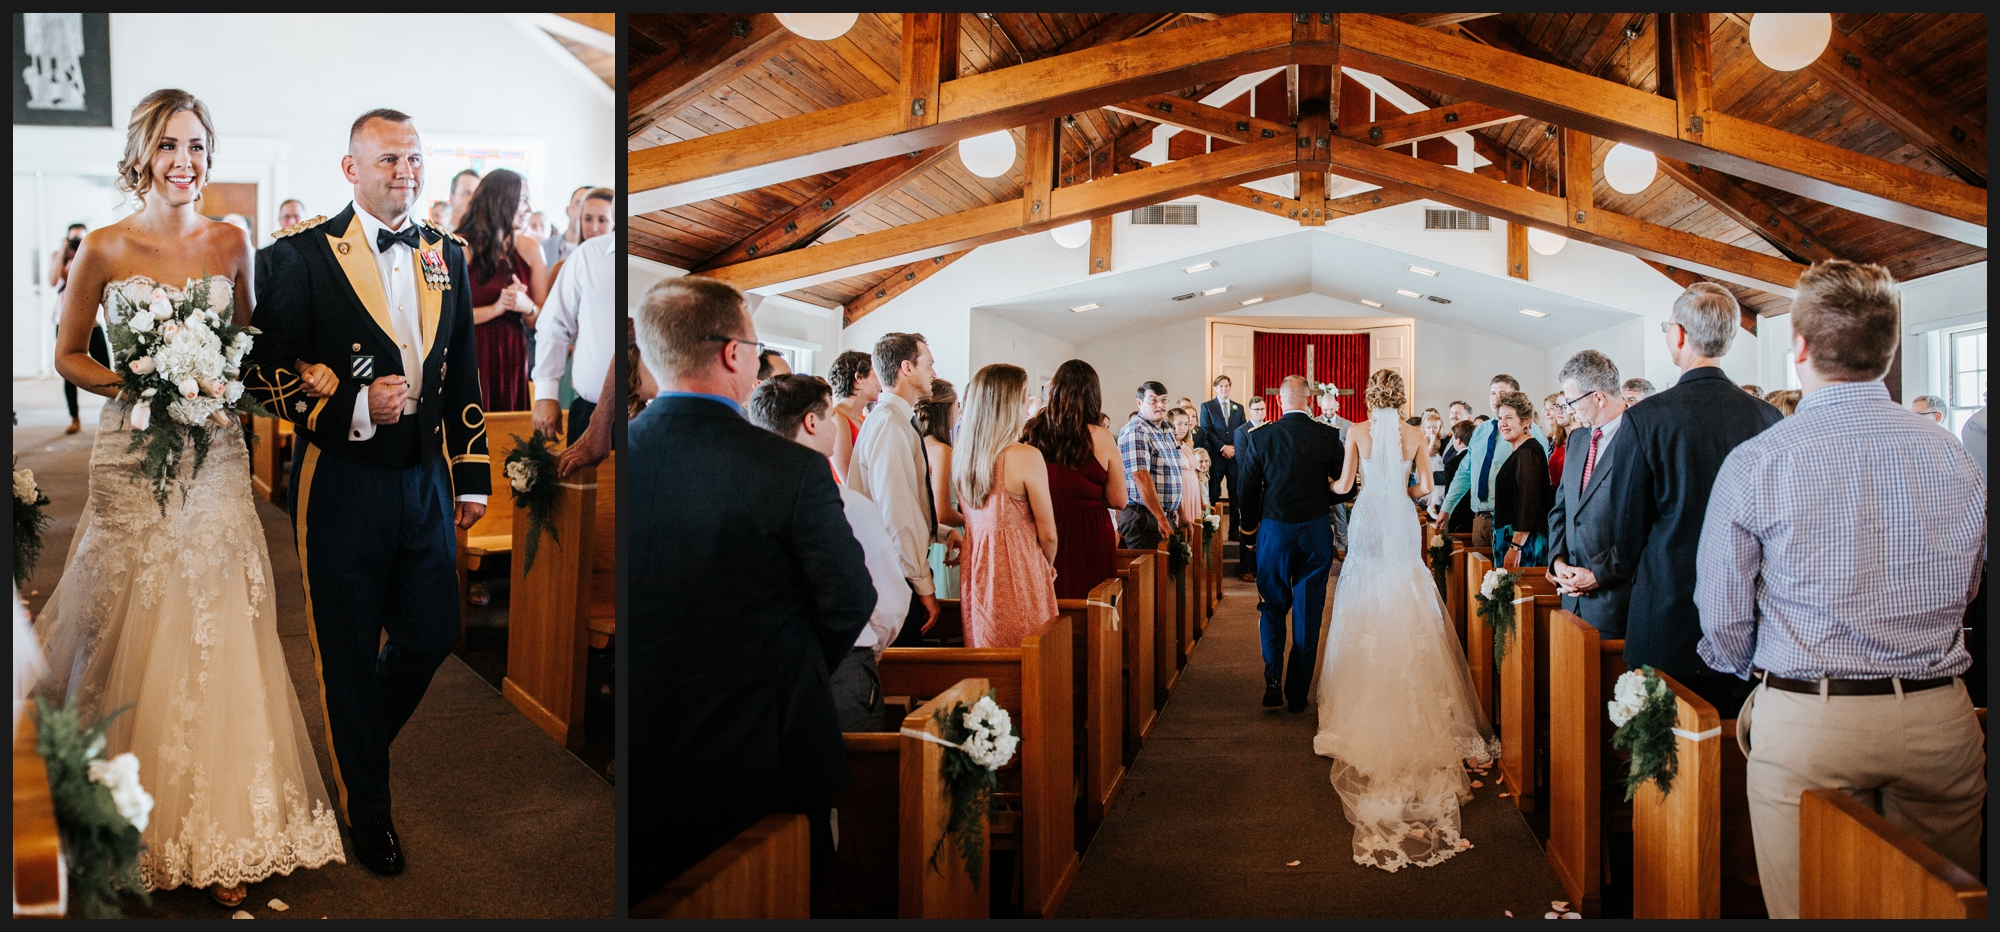 Orlando-Wedding-Photographer-destination-wedding-photographer-florida-wedding-photographer-bohemian-wedding-photographer_0016.jpg